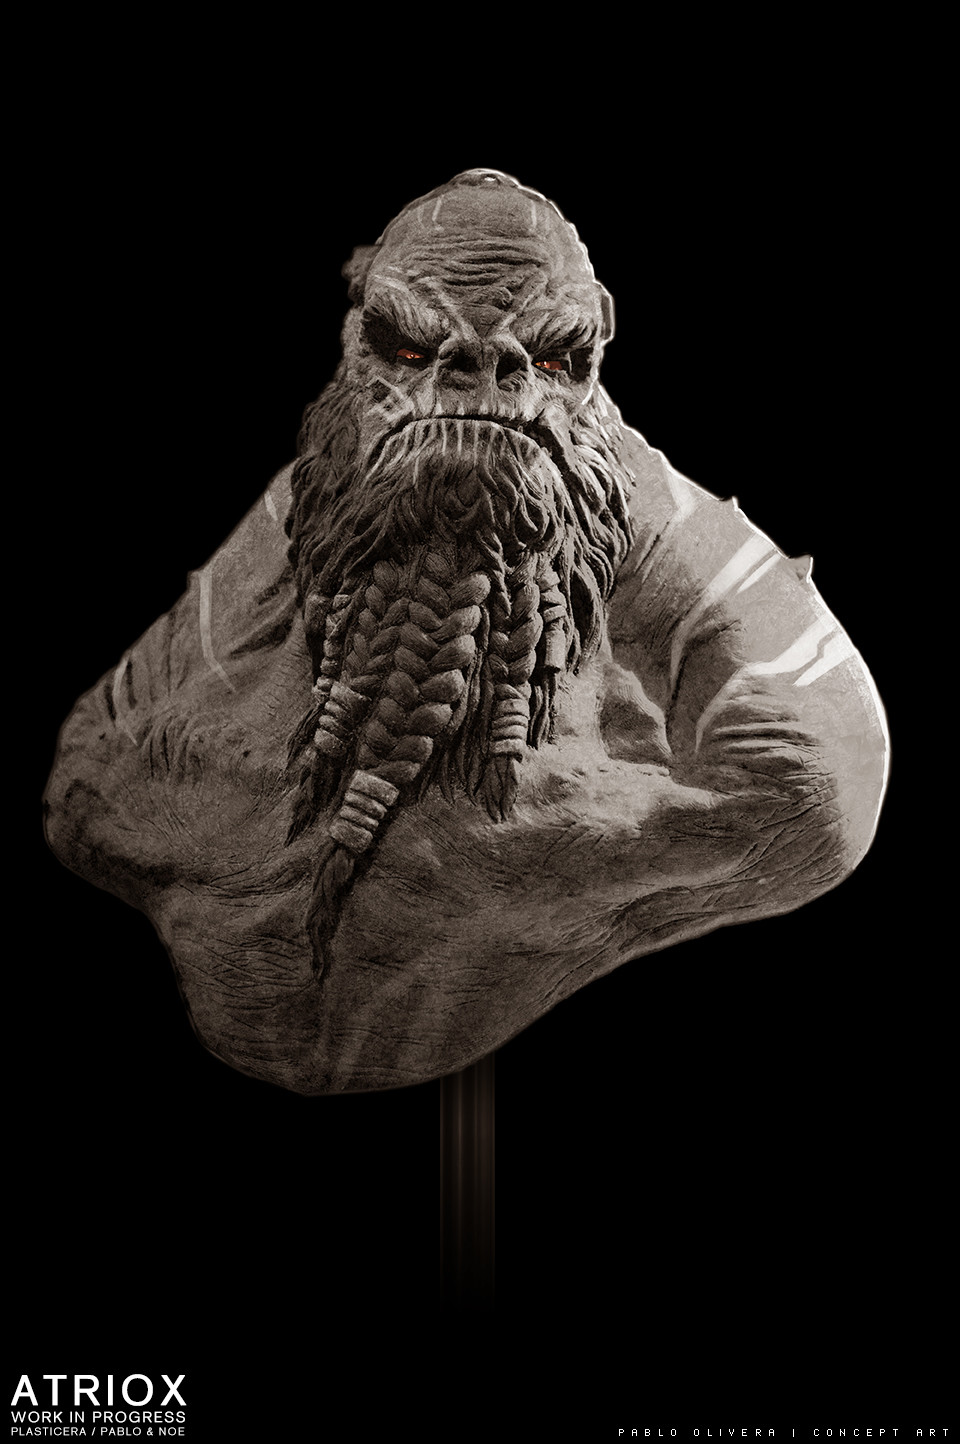 Pablo olivera atriox sculpture plasticera by pablo olivera 06